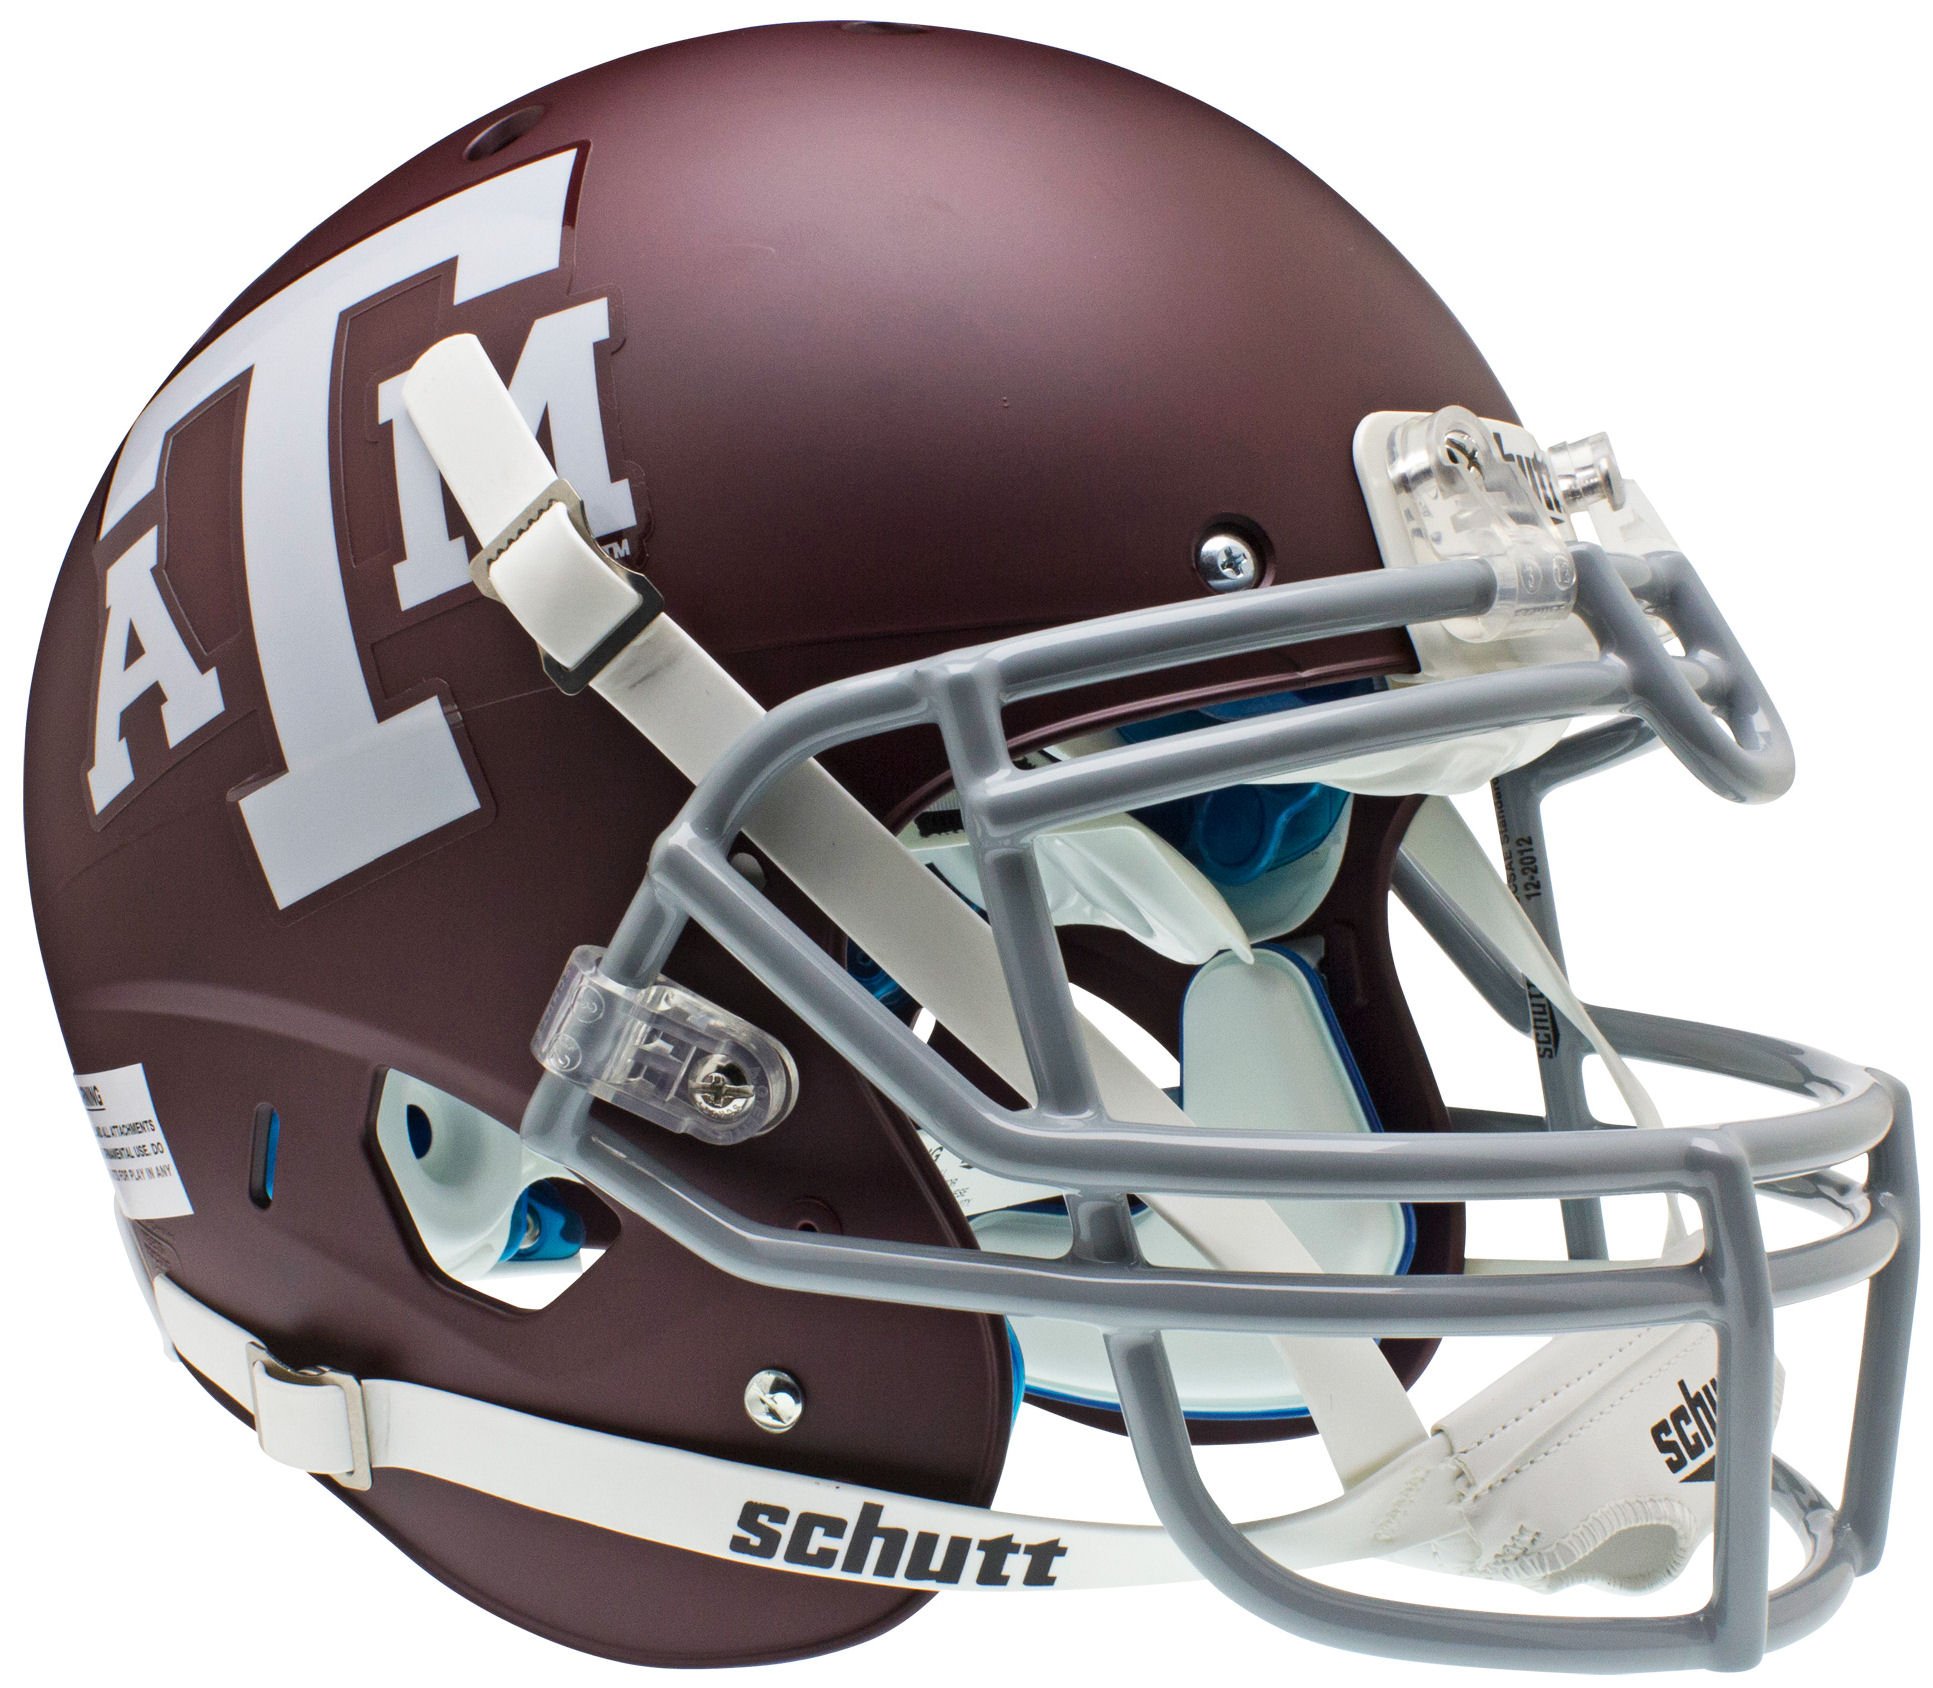 Texas A&M Aggies Authentic College XP Football Helmet Schutt <B>Matte Maroon</B>